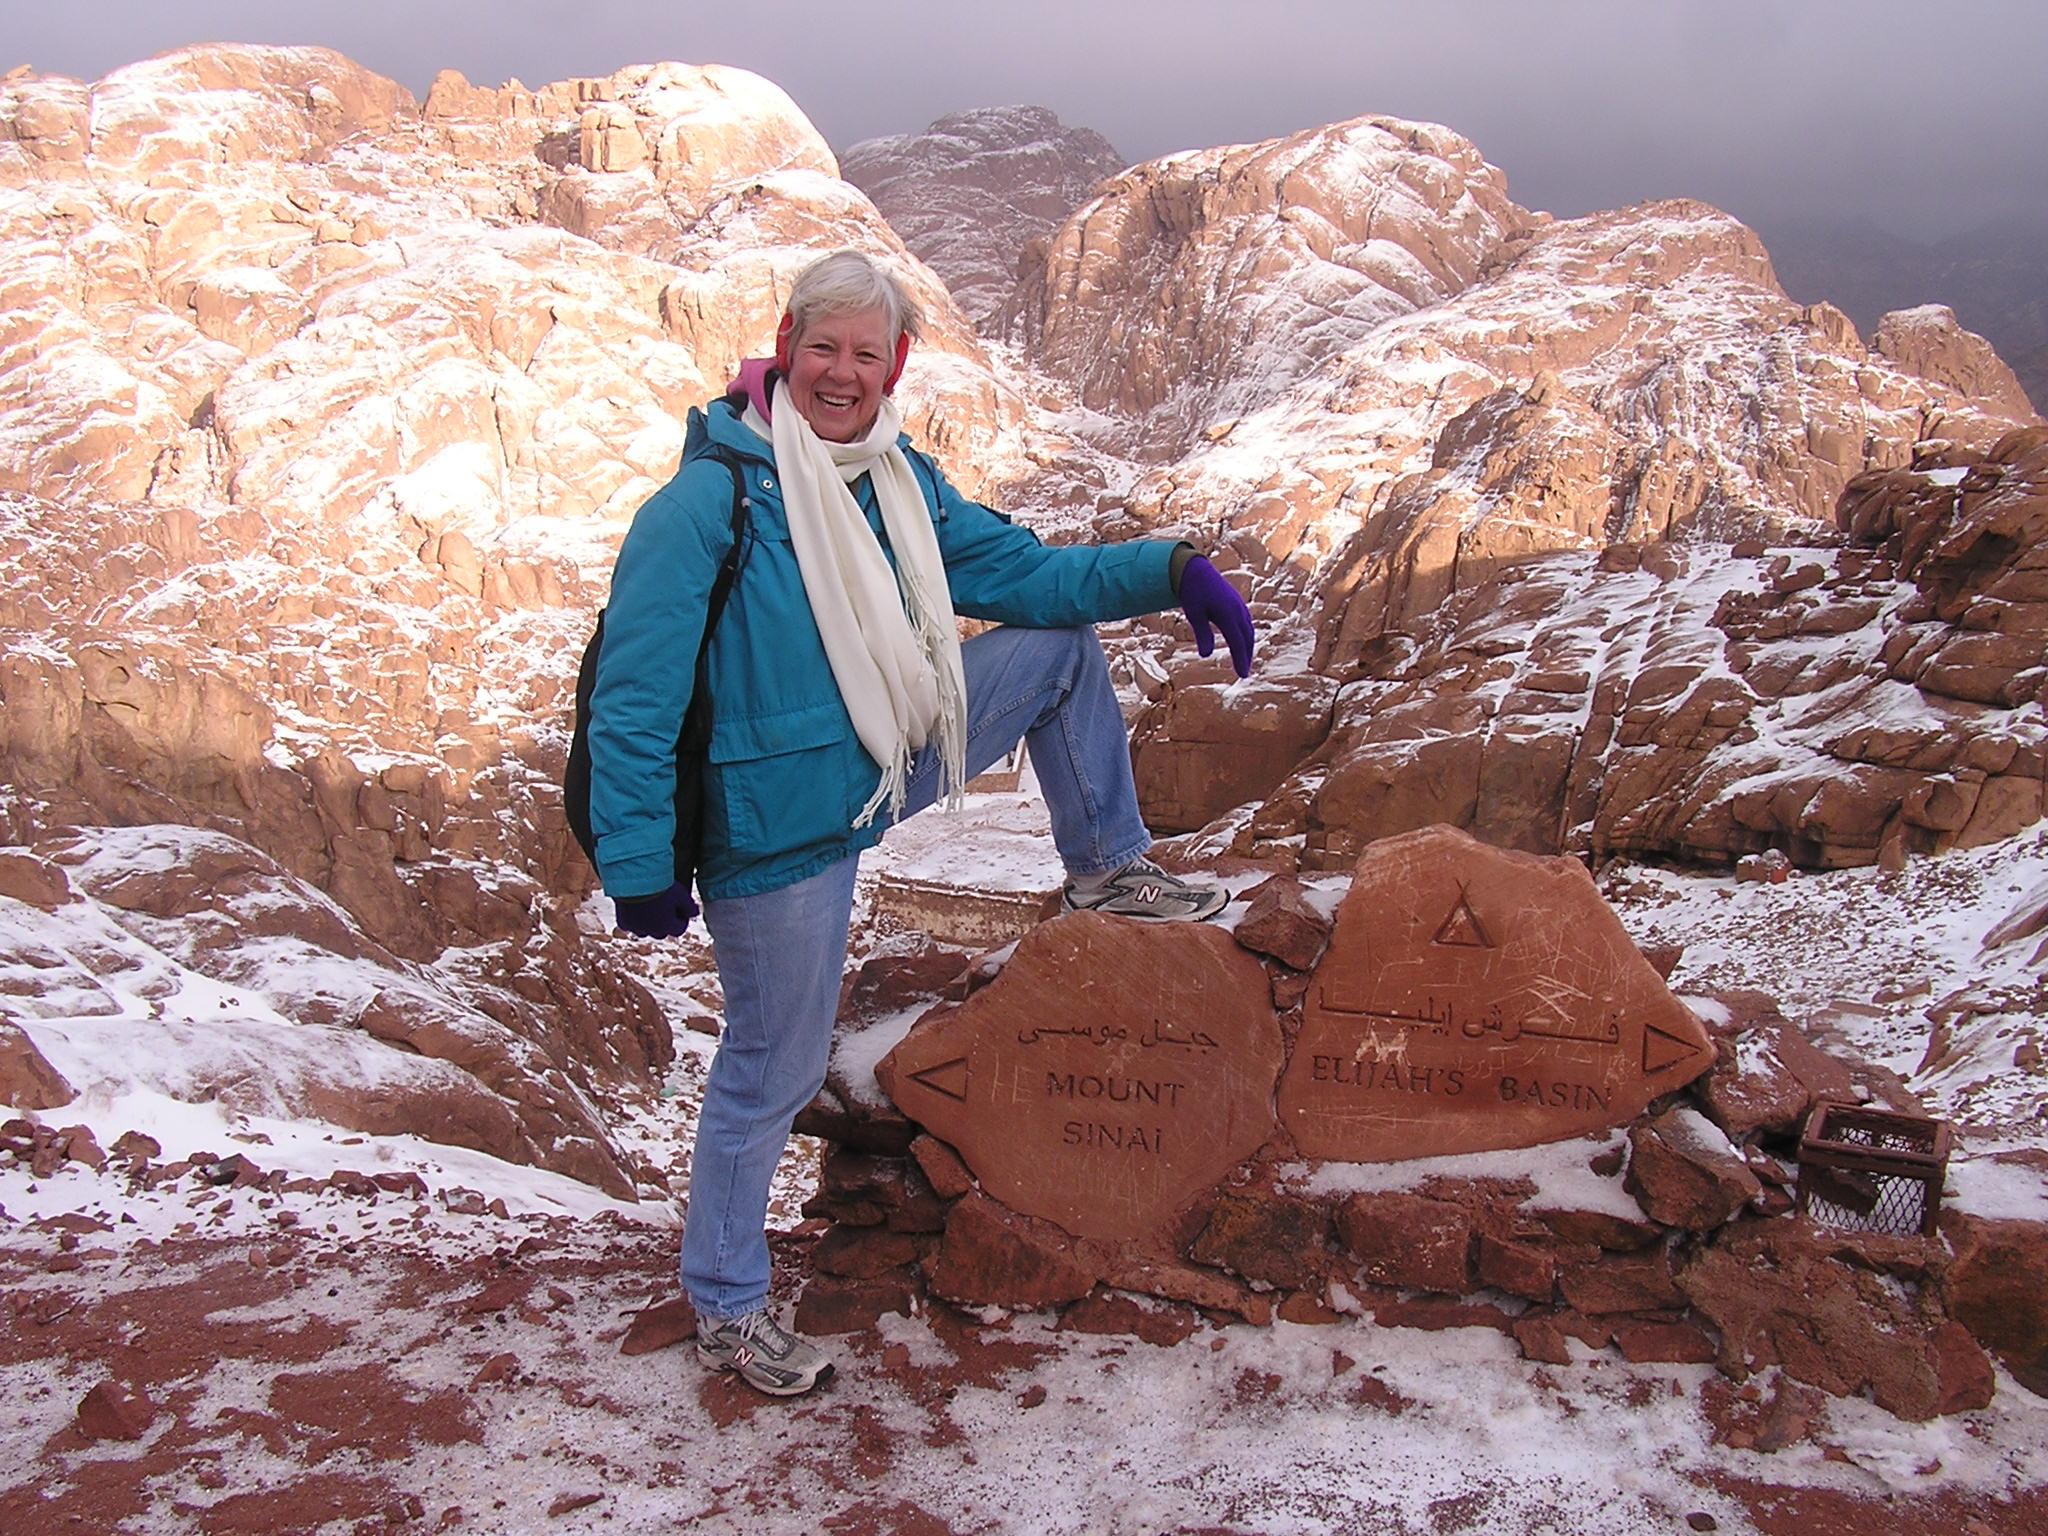 Ann on Sinai rock.jpg